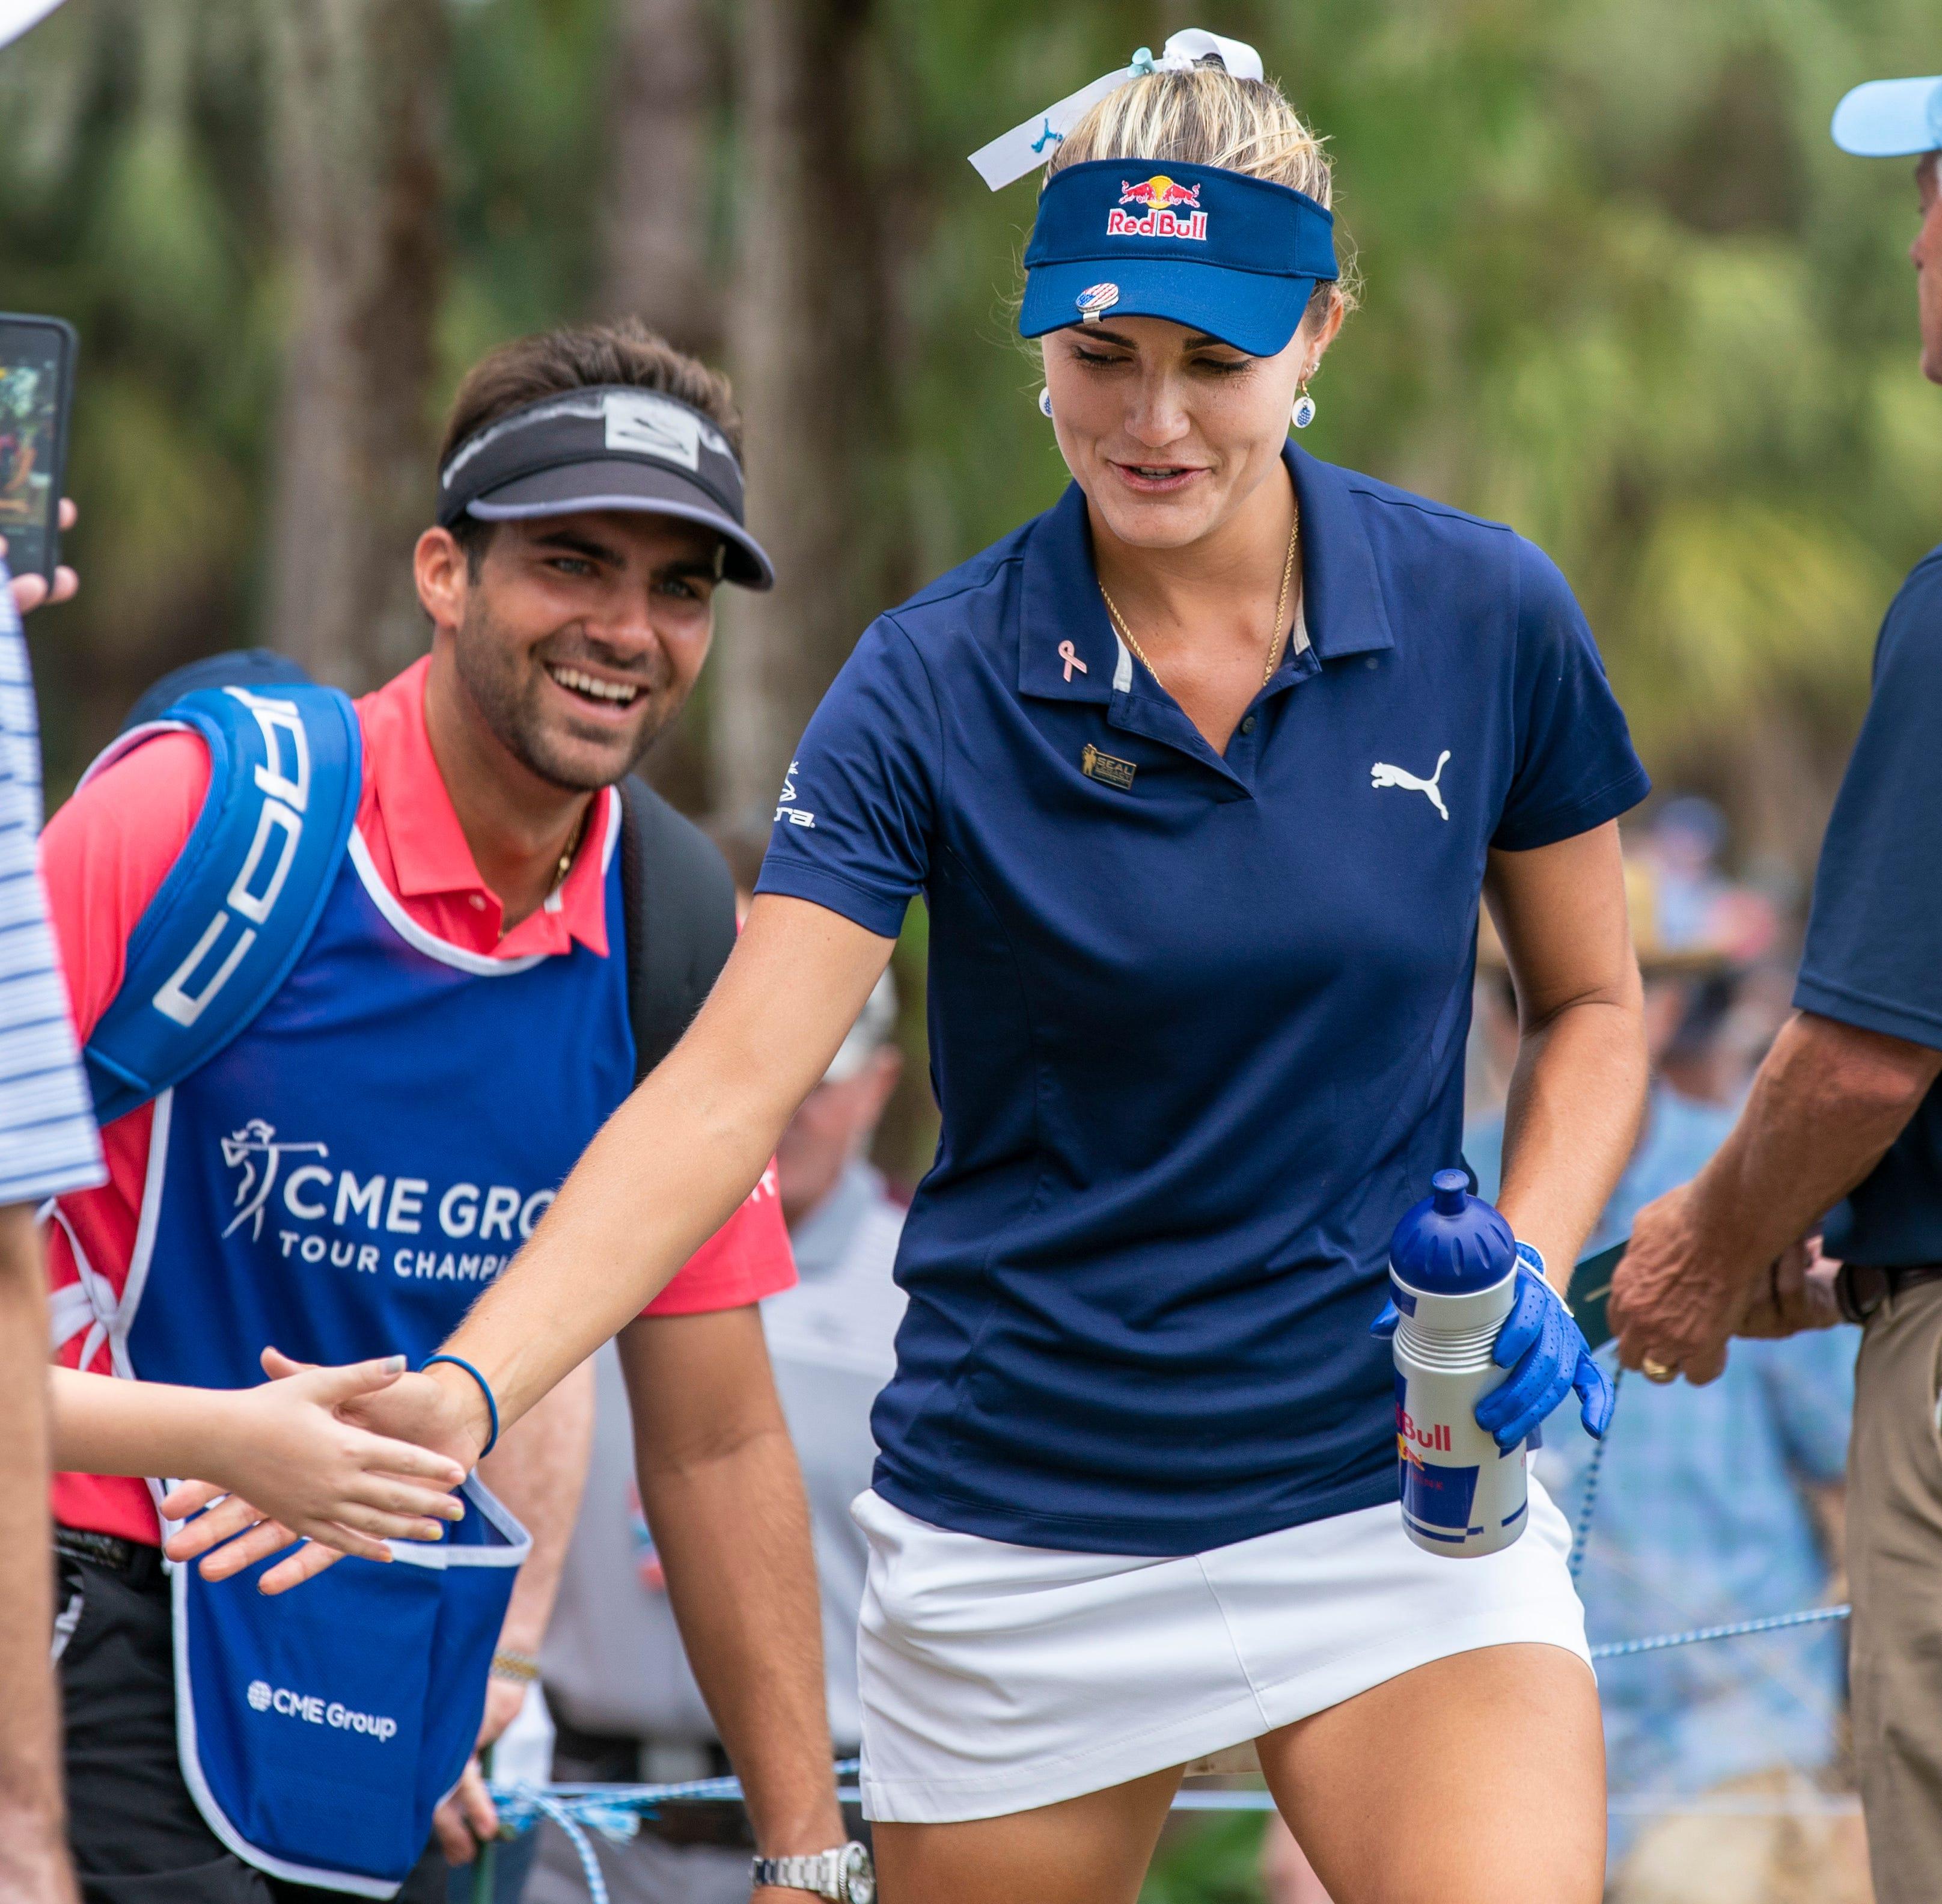 CME Group Tour Championship: Lexi Thompson, Ariya Jutanugarn big winners again in Naples